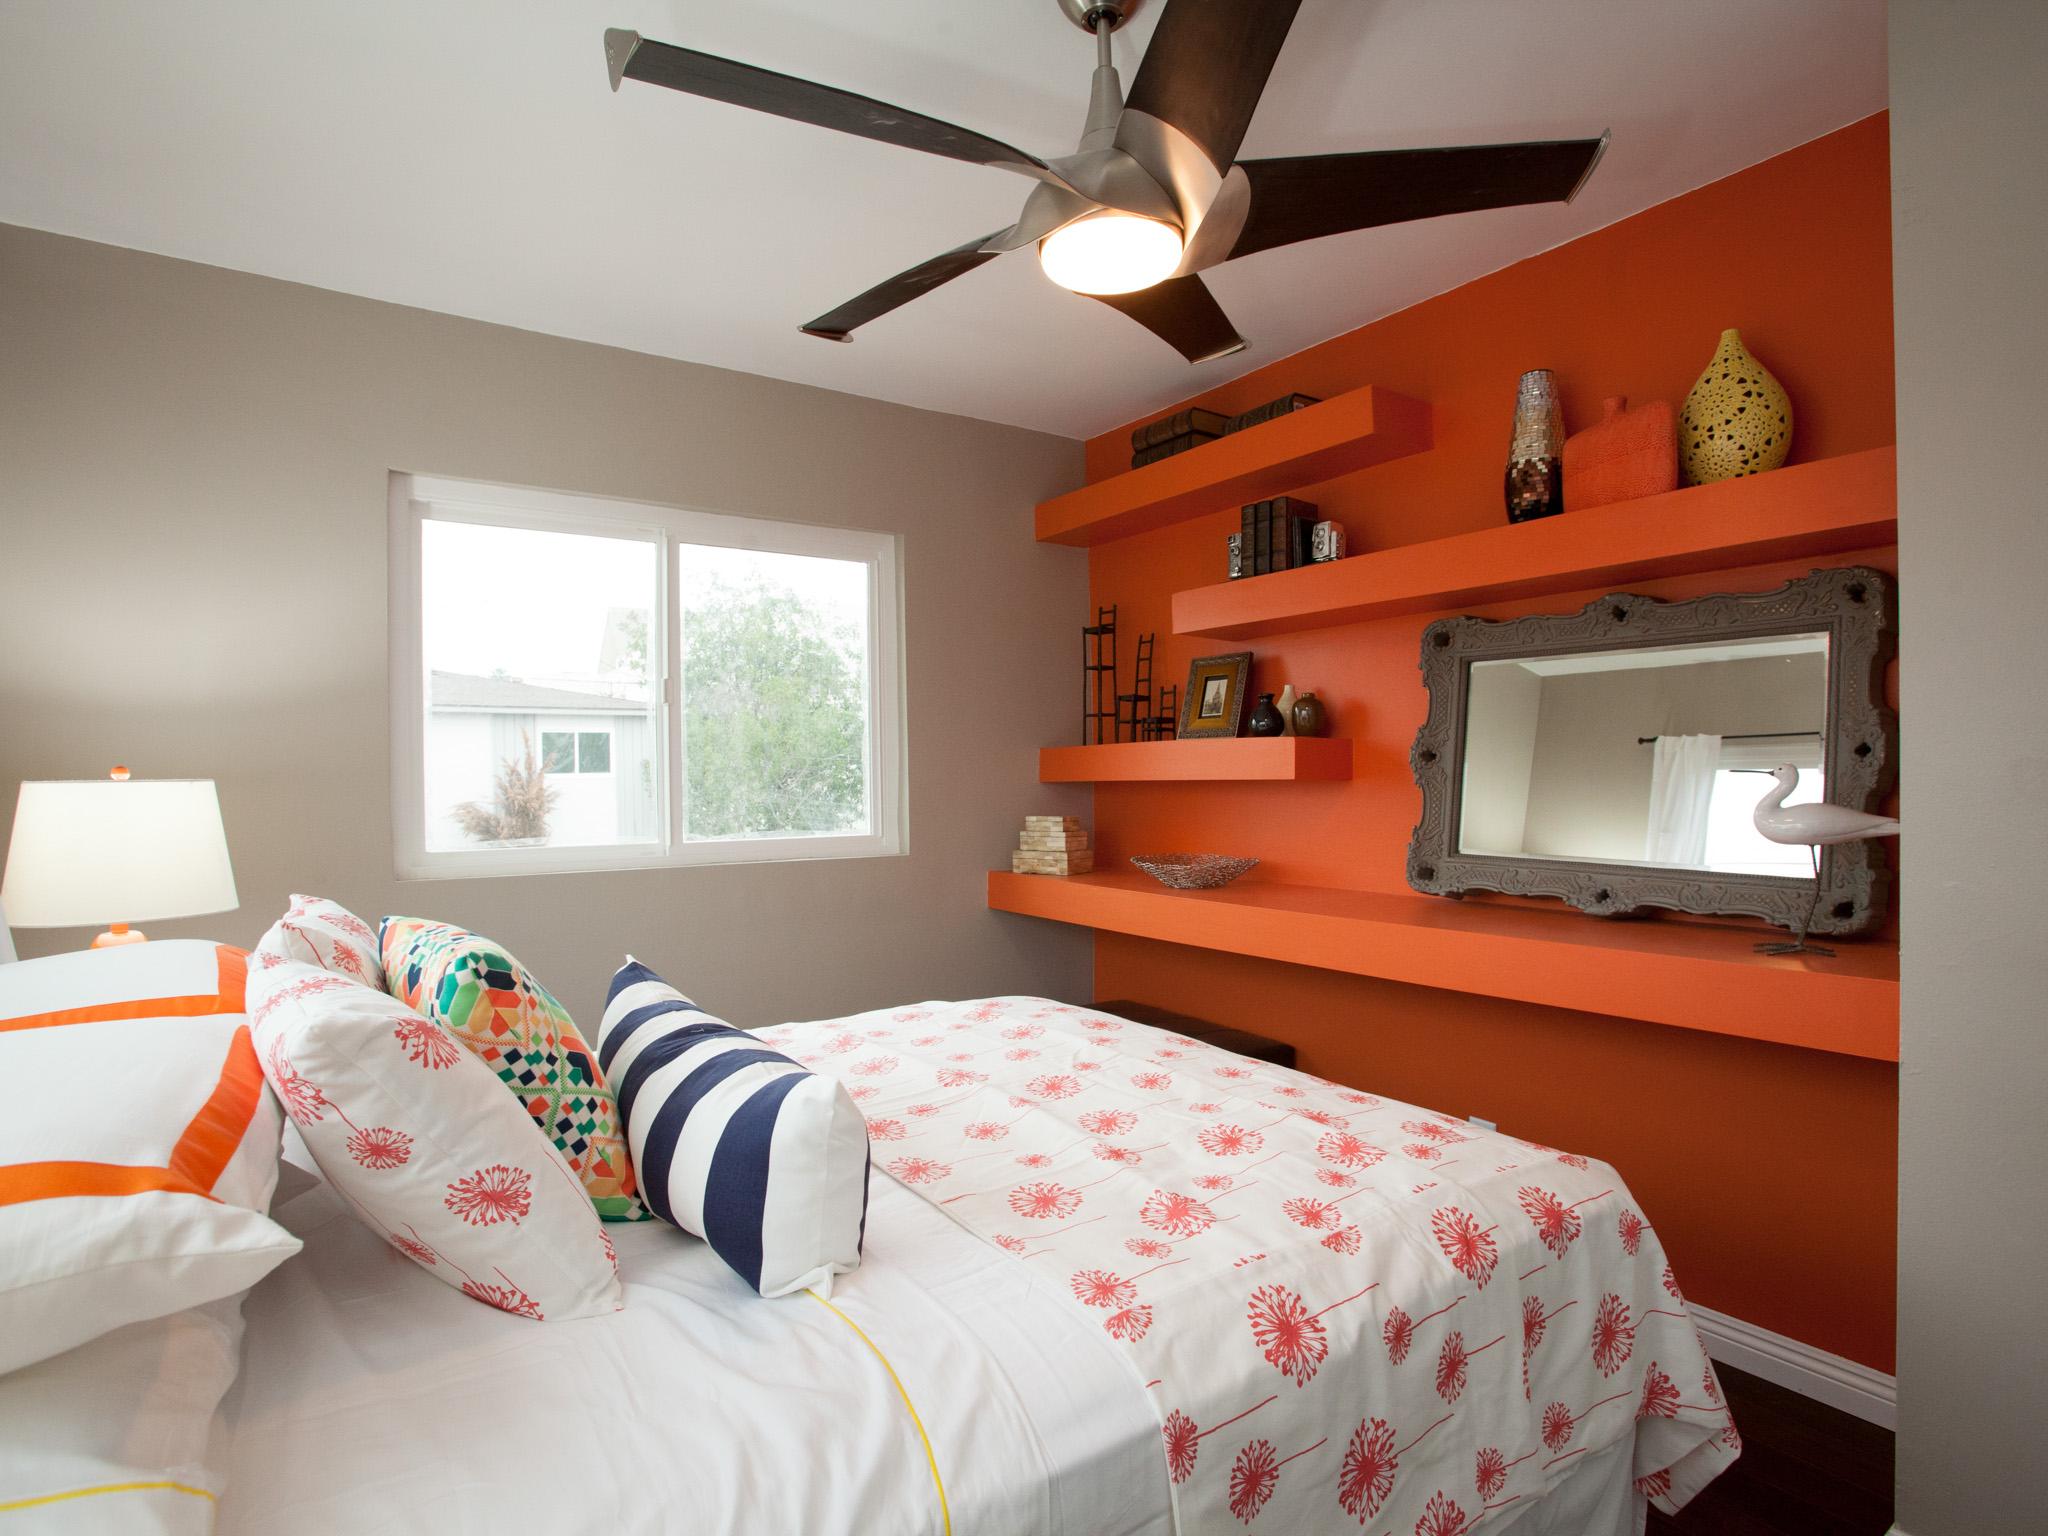 Orange And Grey Bedroom Walls. Orange And Grey Bedroom Walls image information